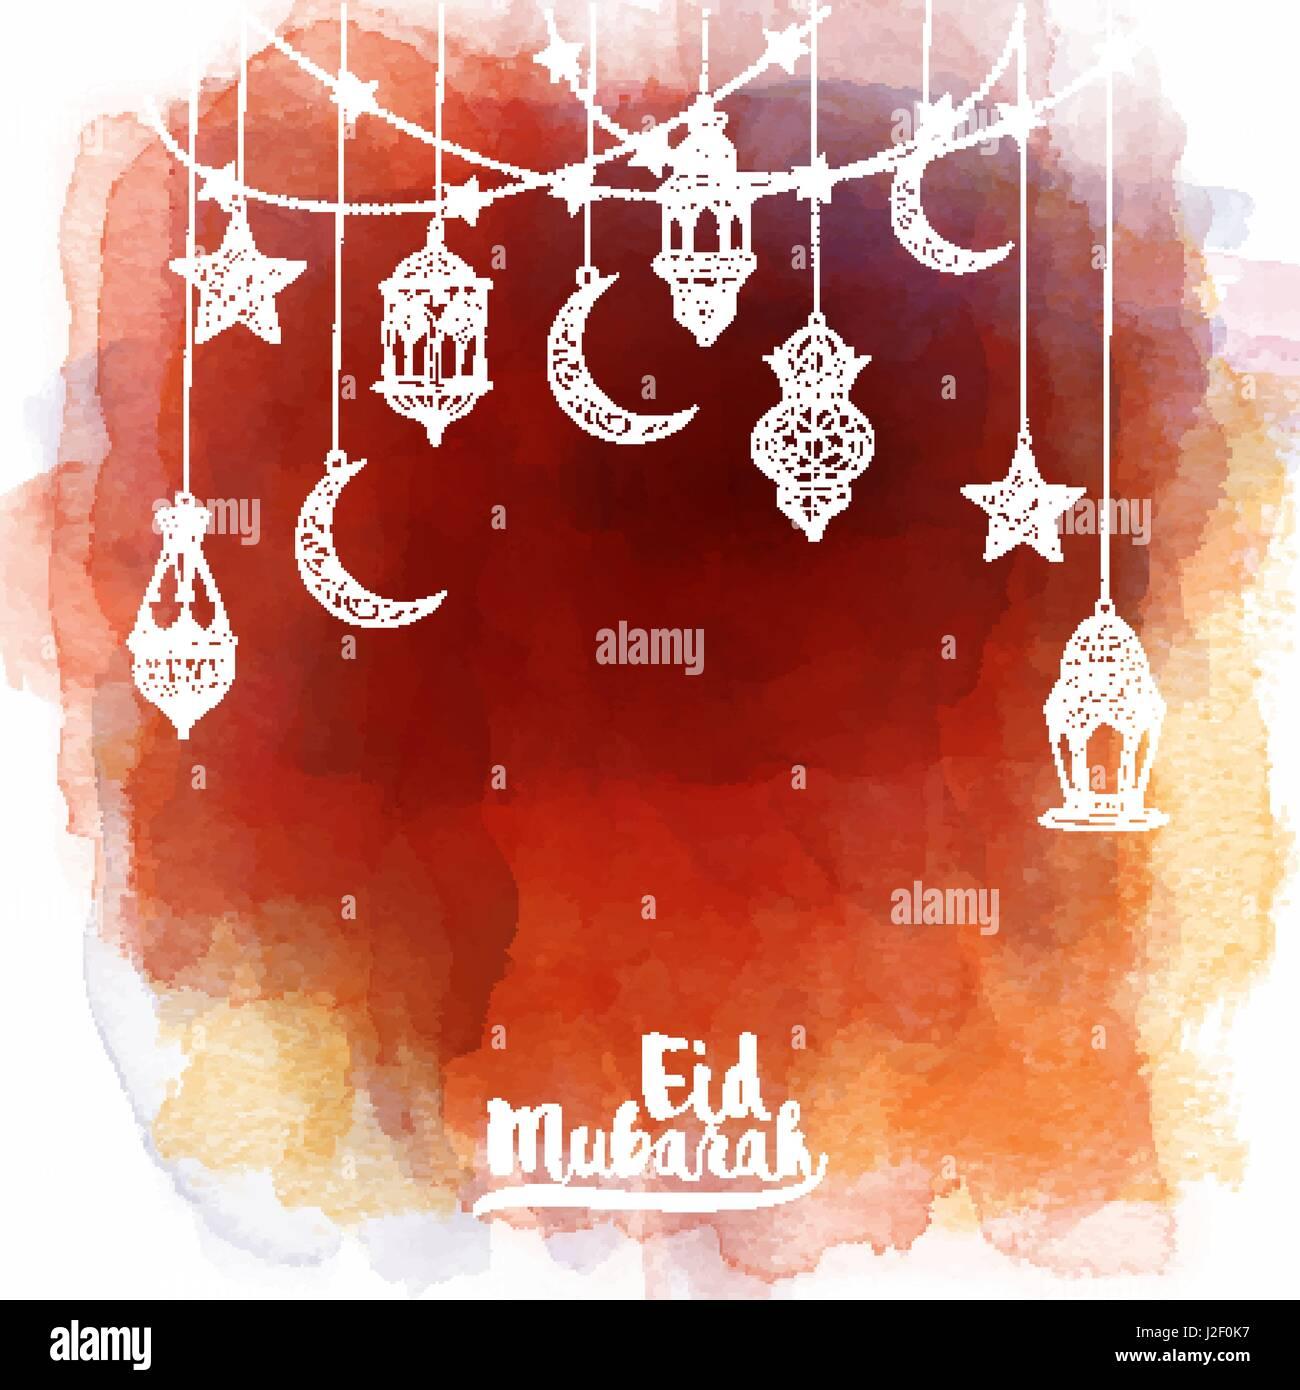 Eid Mubarak Greeting Card Template Islamic Banner Background With Stock Vector Image Amp Art Alamy